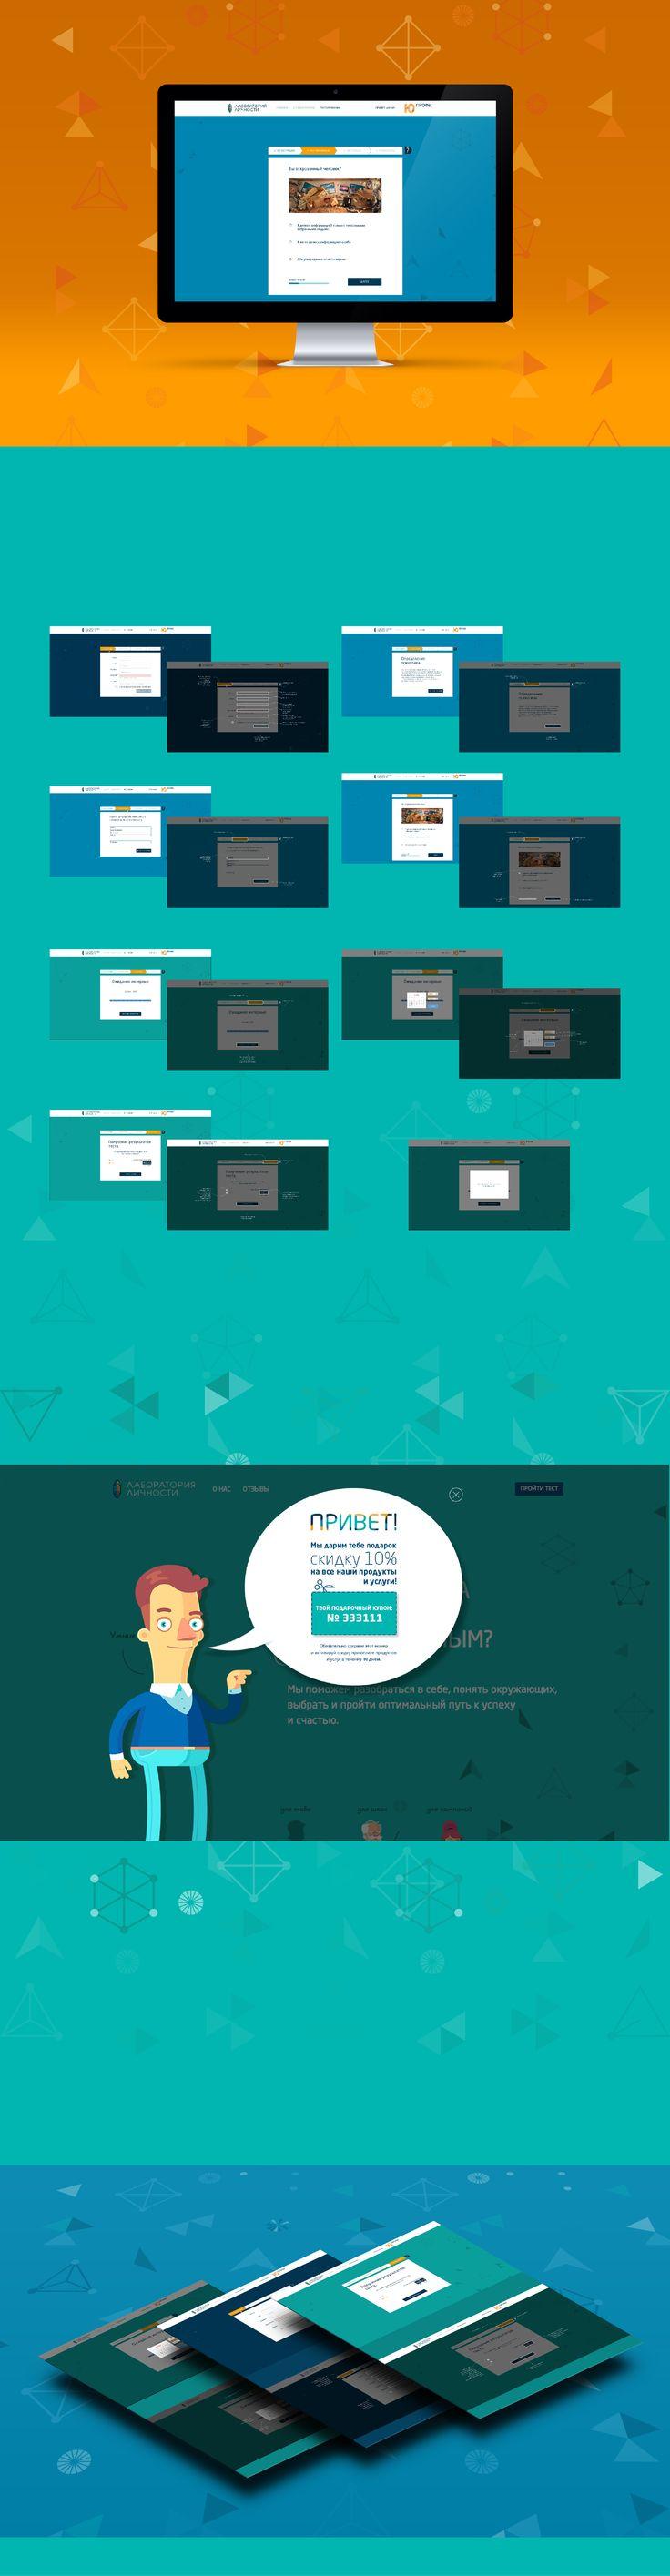 "Дизайн внутренних страниц онлайн сервиса ""Лаборатория Личности"""